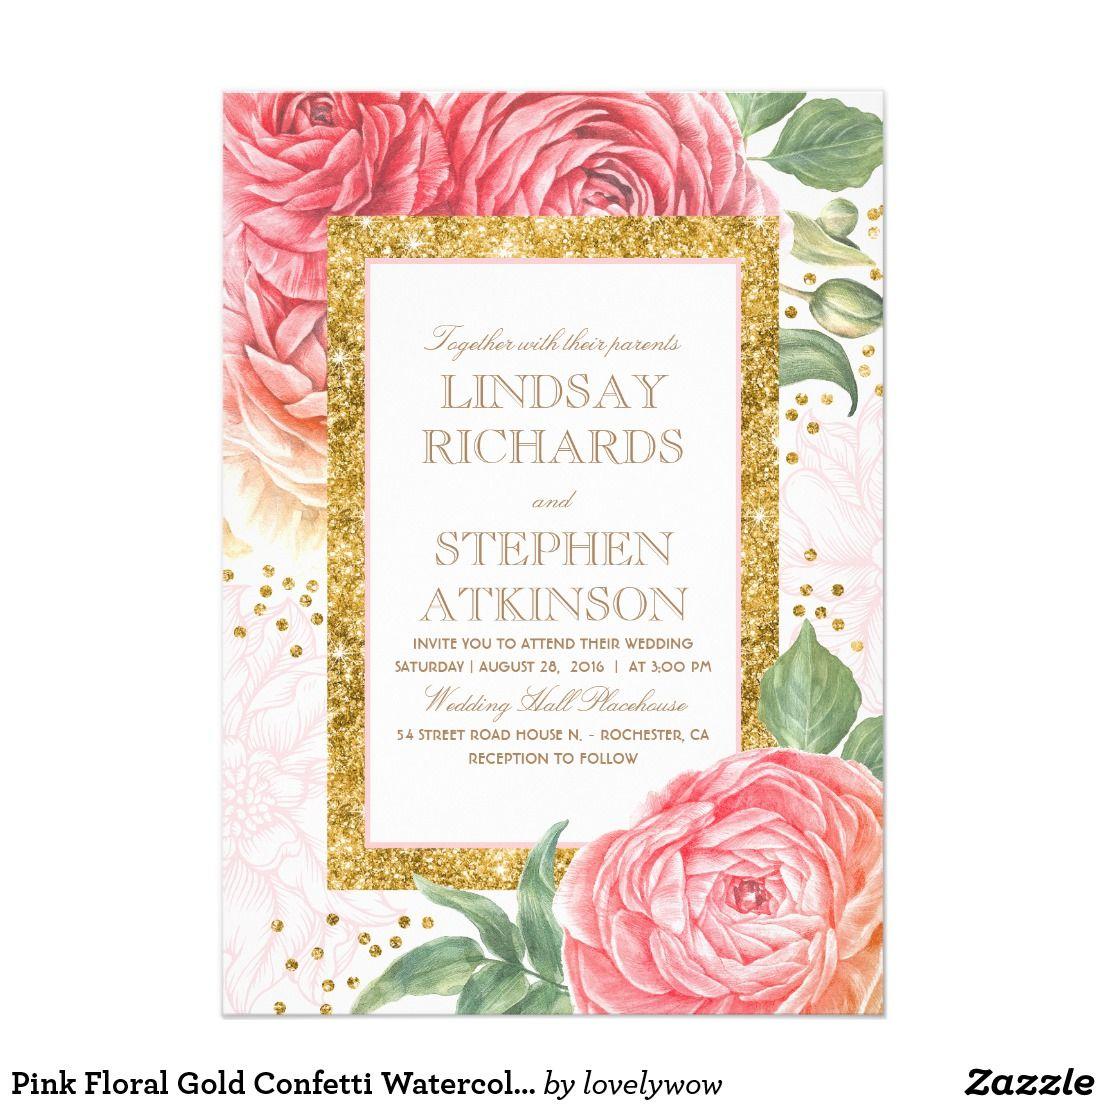 Pink Floral Gold Confetti Watercolor Wedding Invitation Watercolor